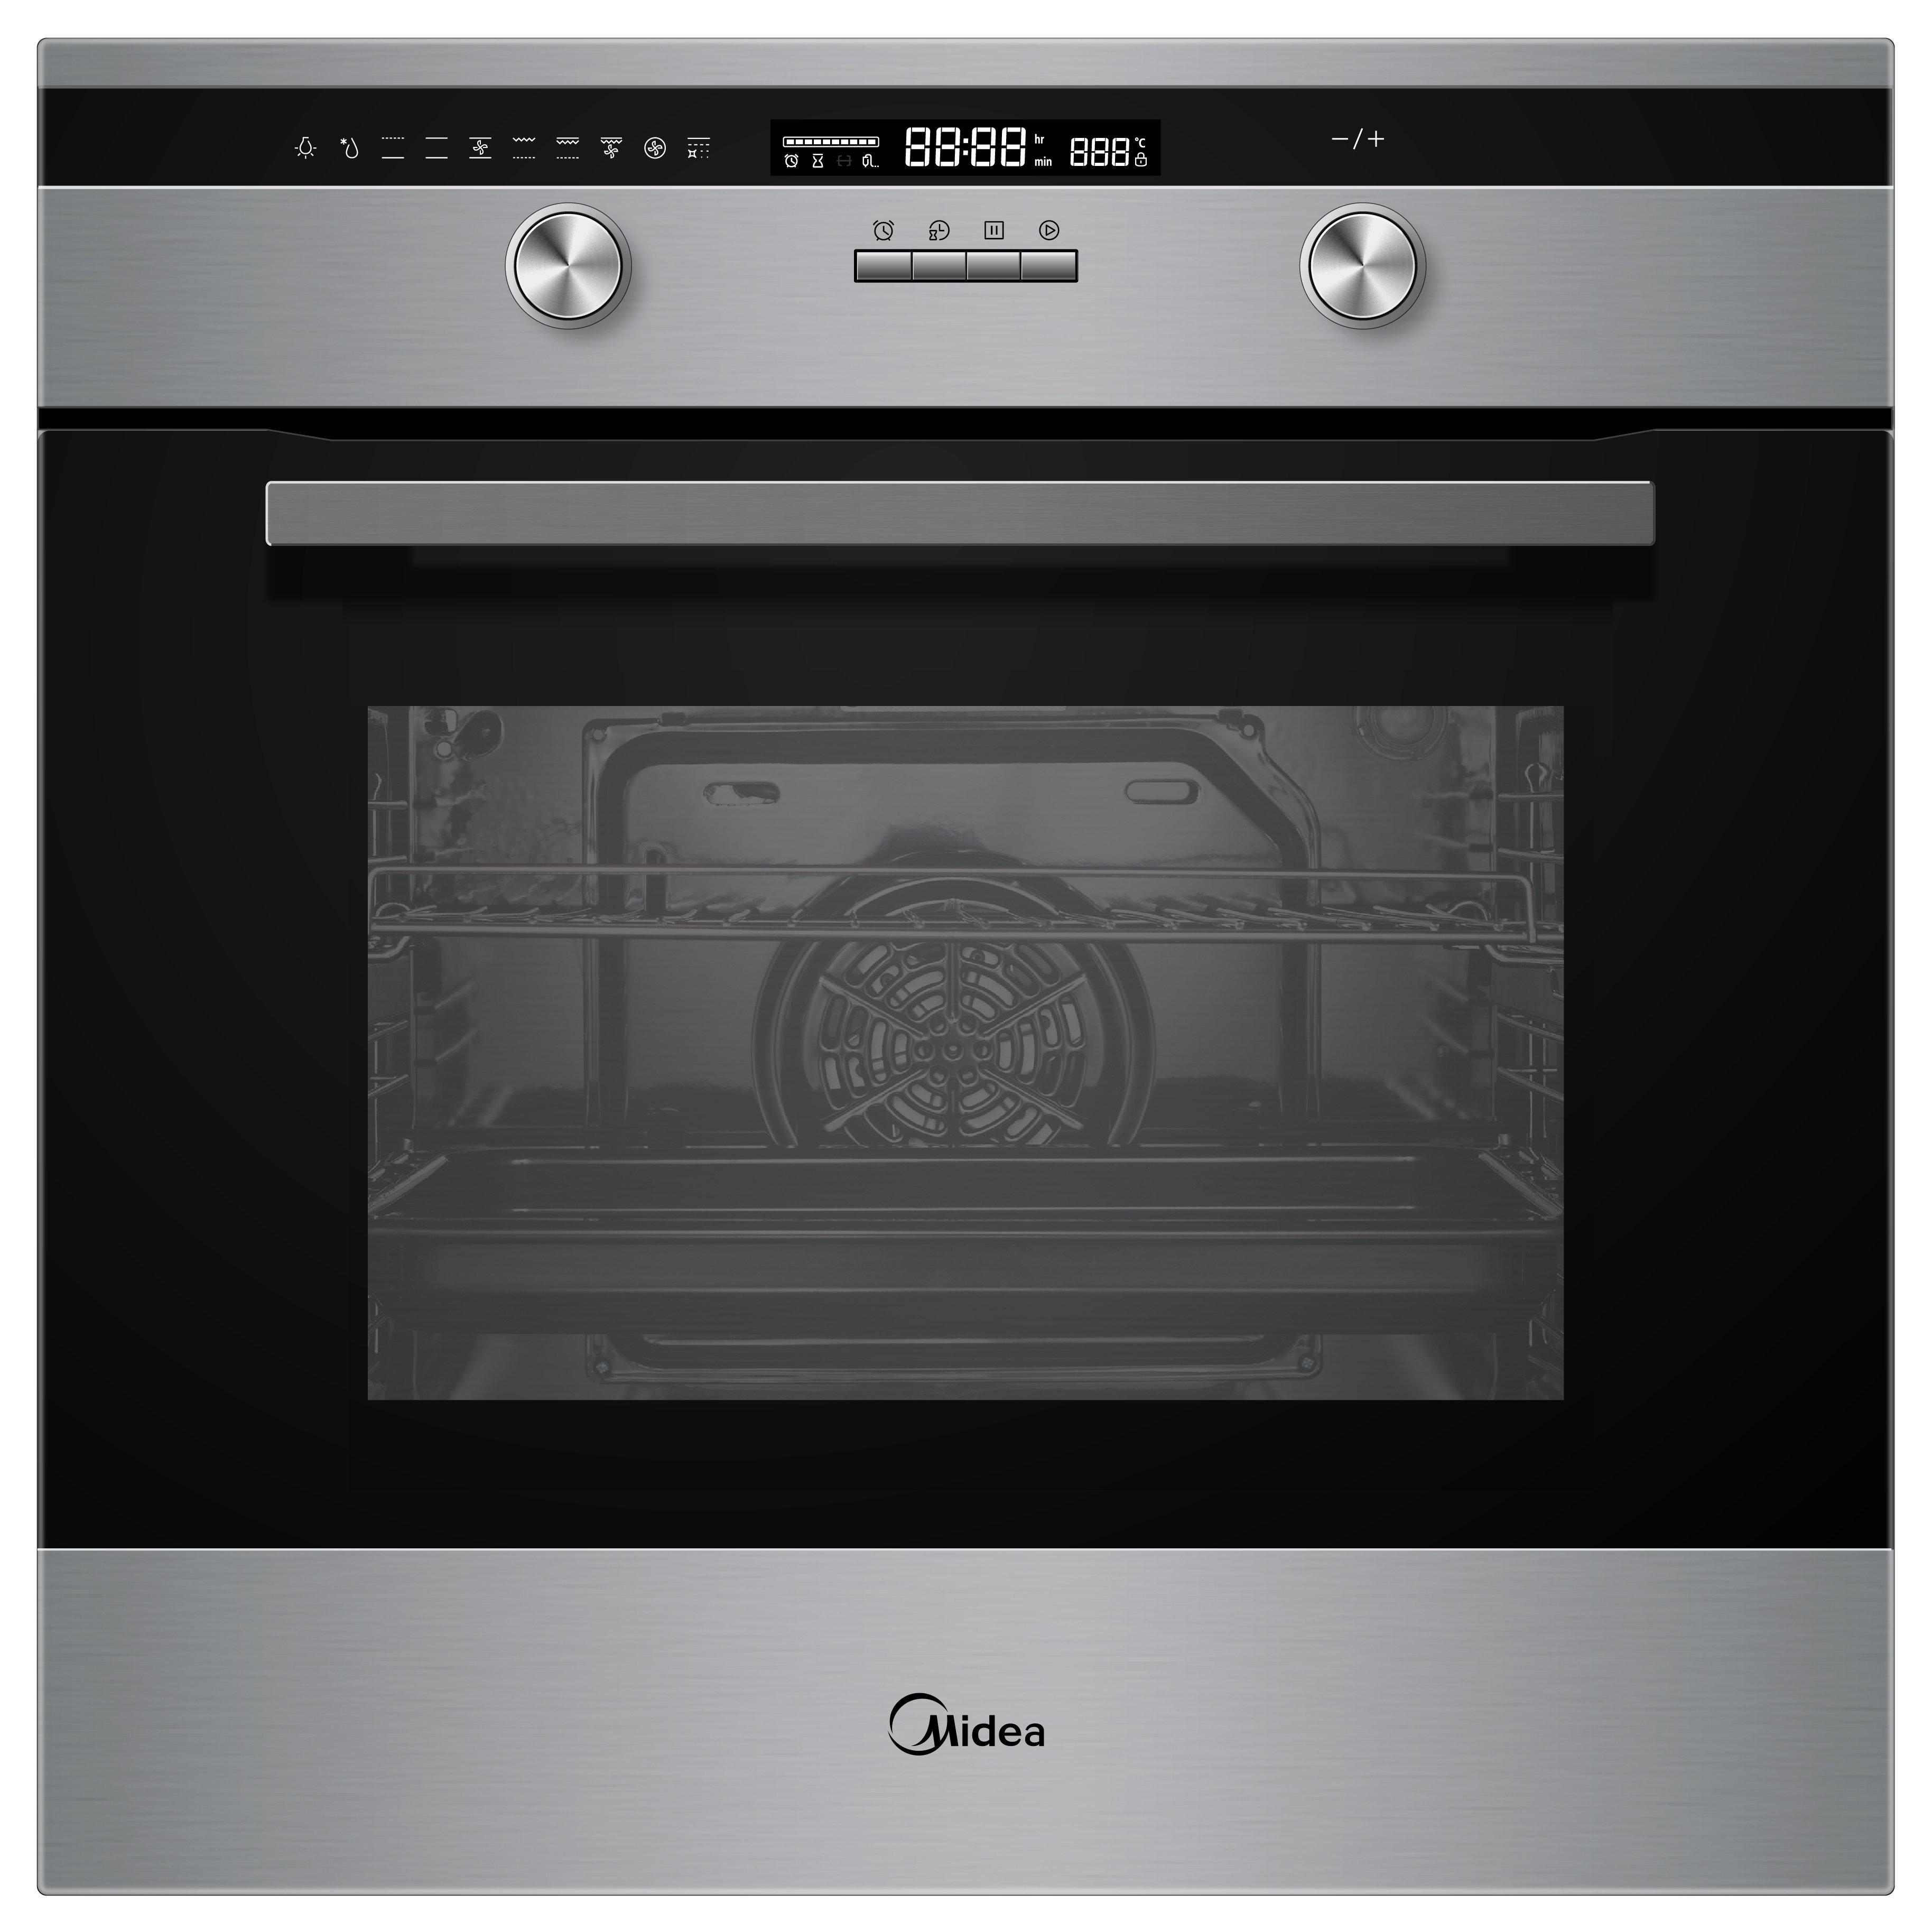 Midea 65EAE41139 Oven